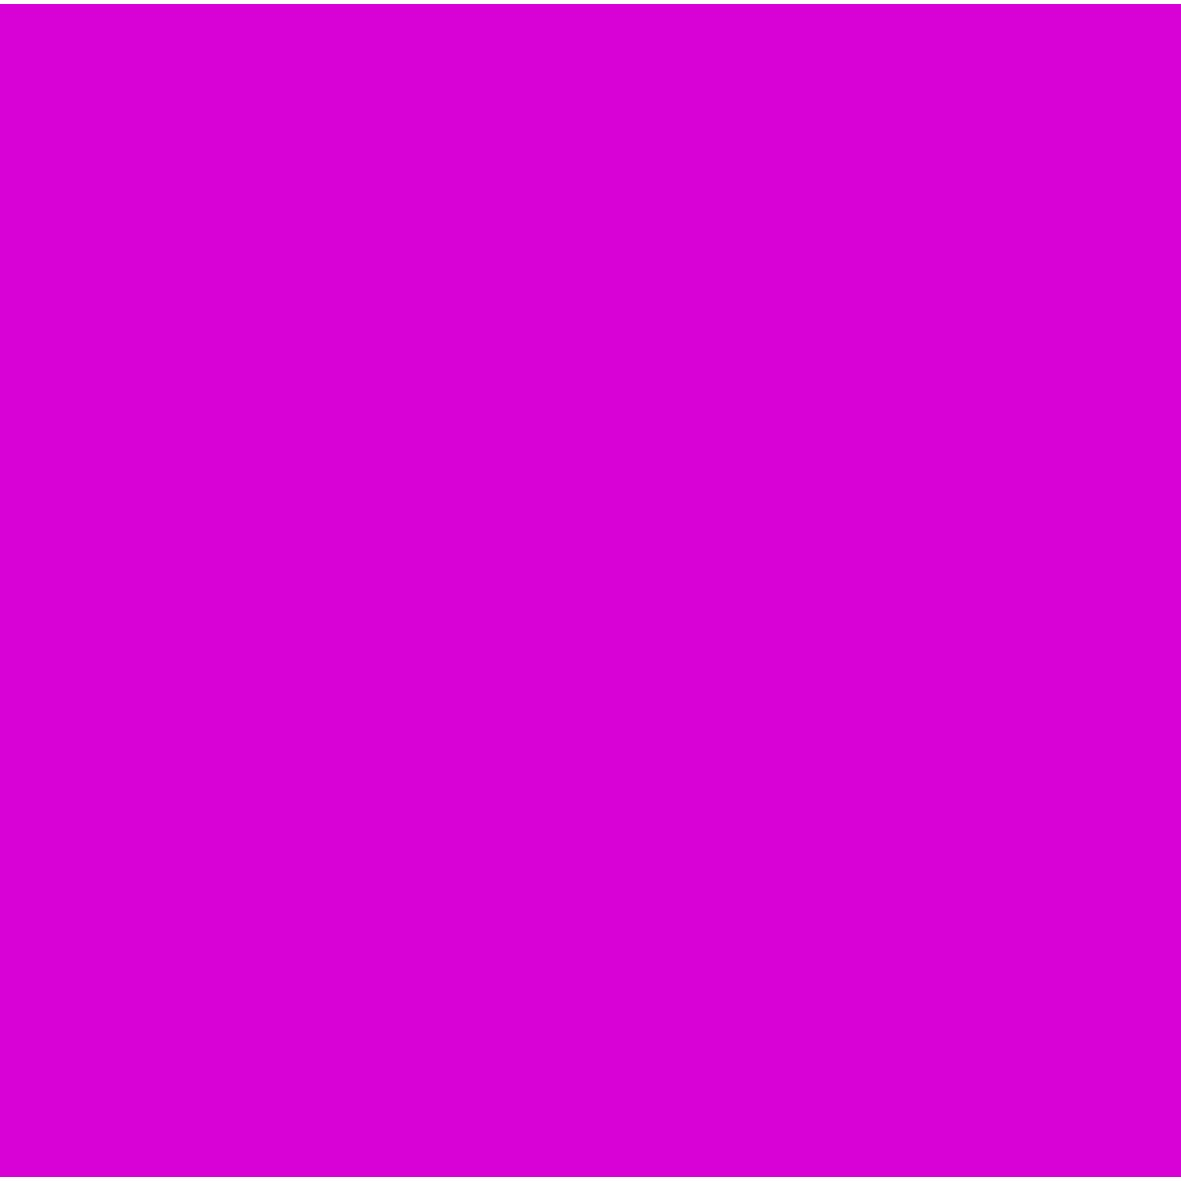 Rev tement adh sif uni laqu violet 2 m x m leroy - Leroy merlin revetement adhesif ...